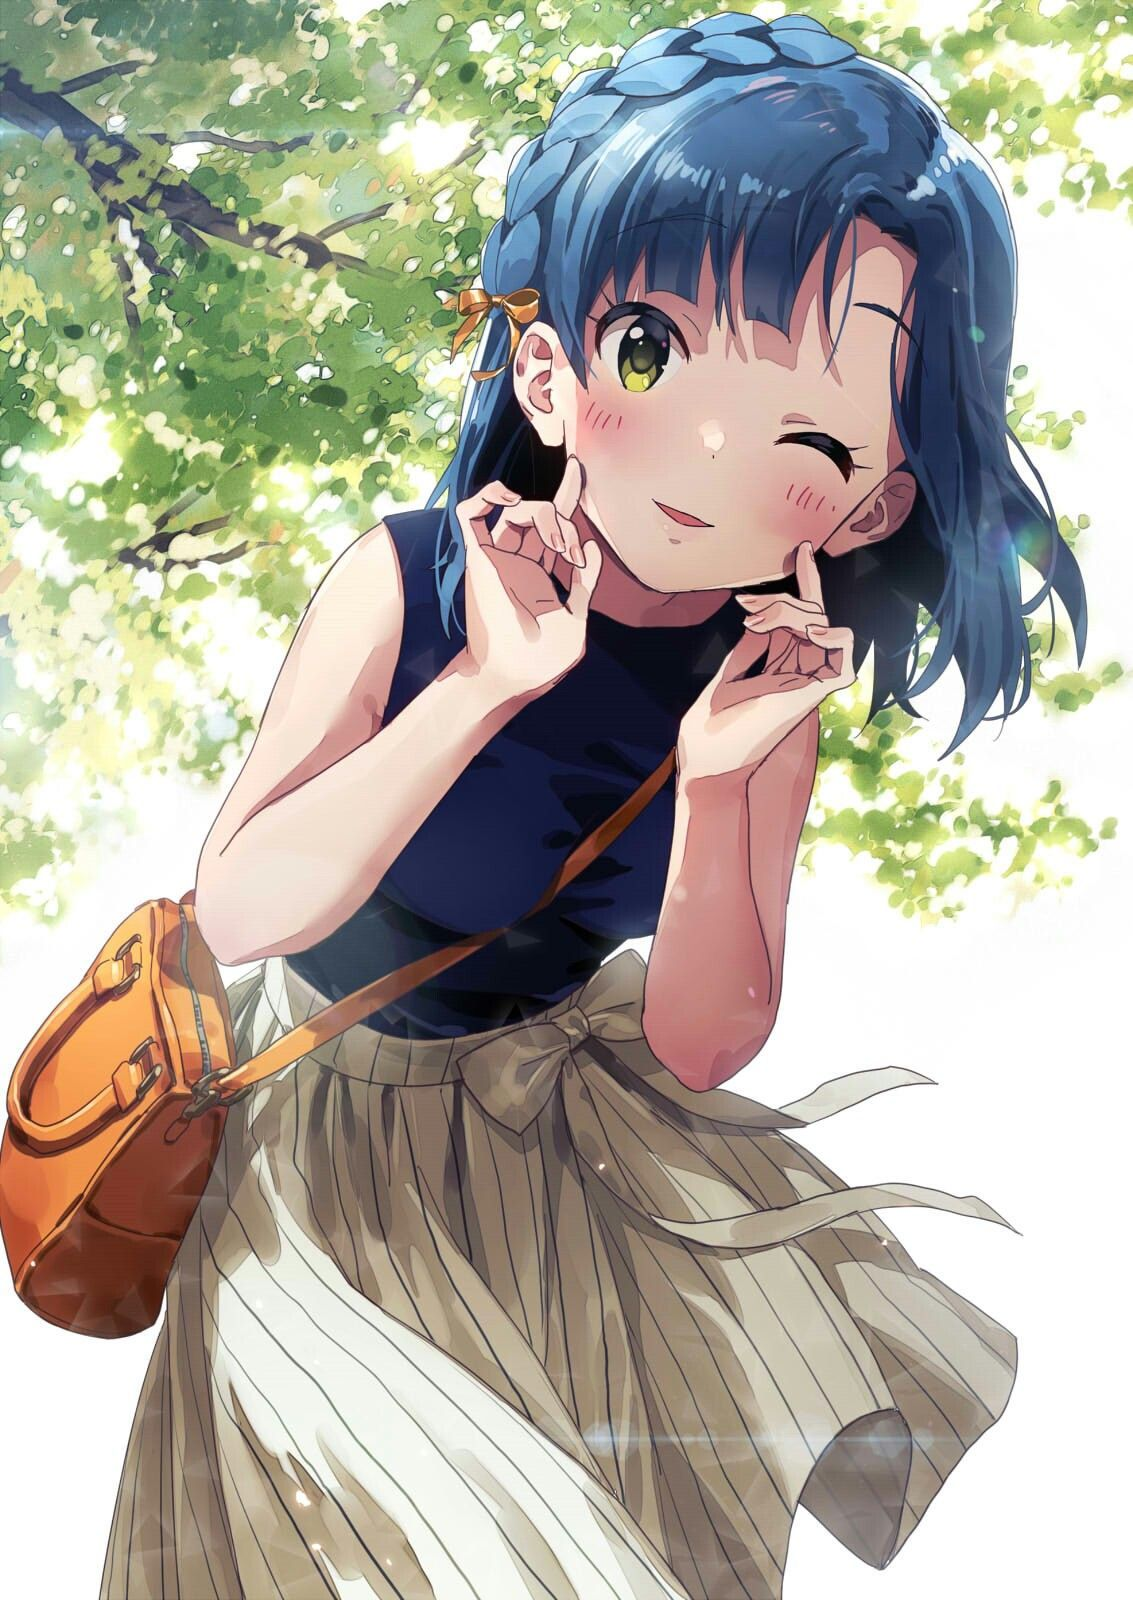 Chicas De Anime Kawaii Mask Ana Google En 2019 Petite